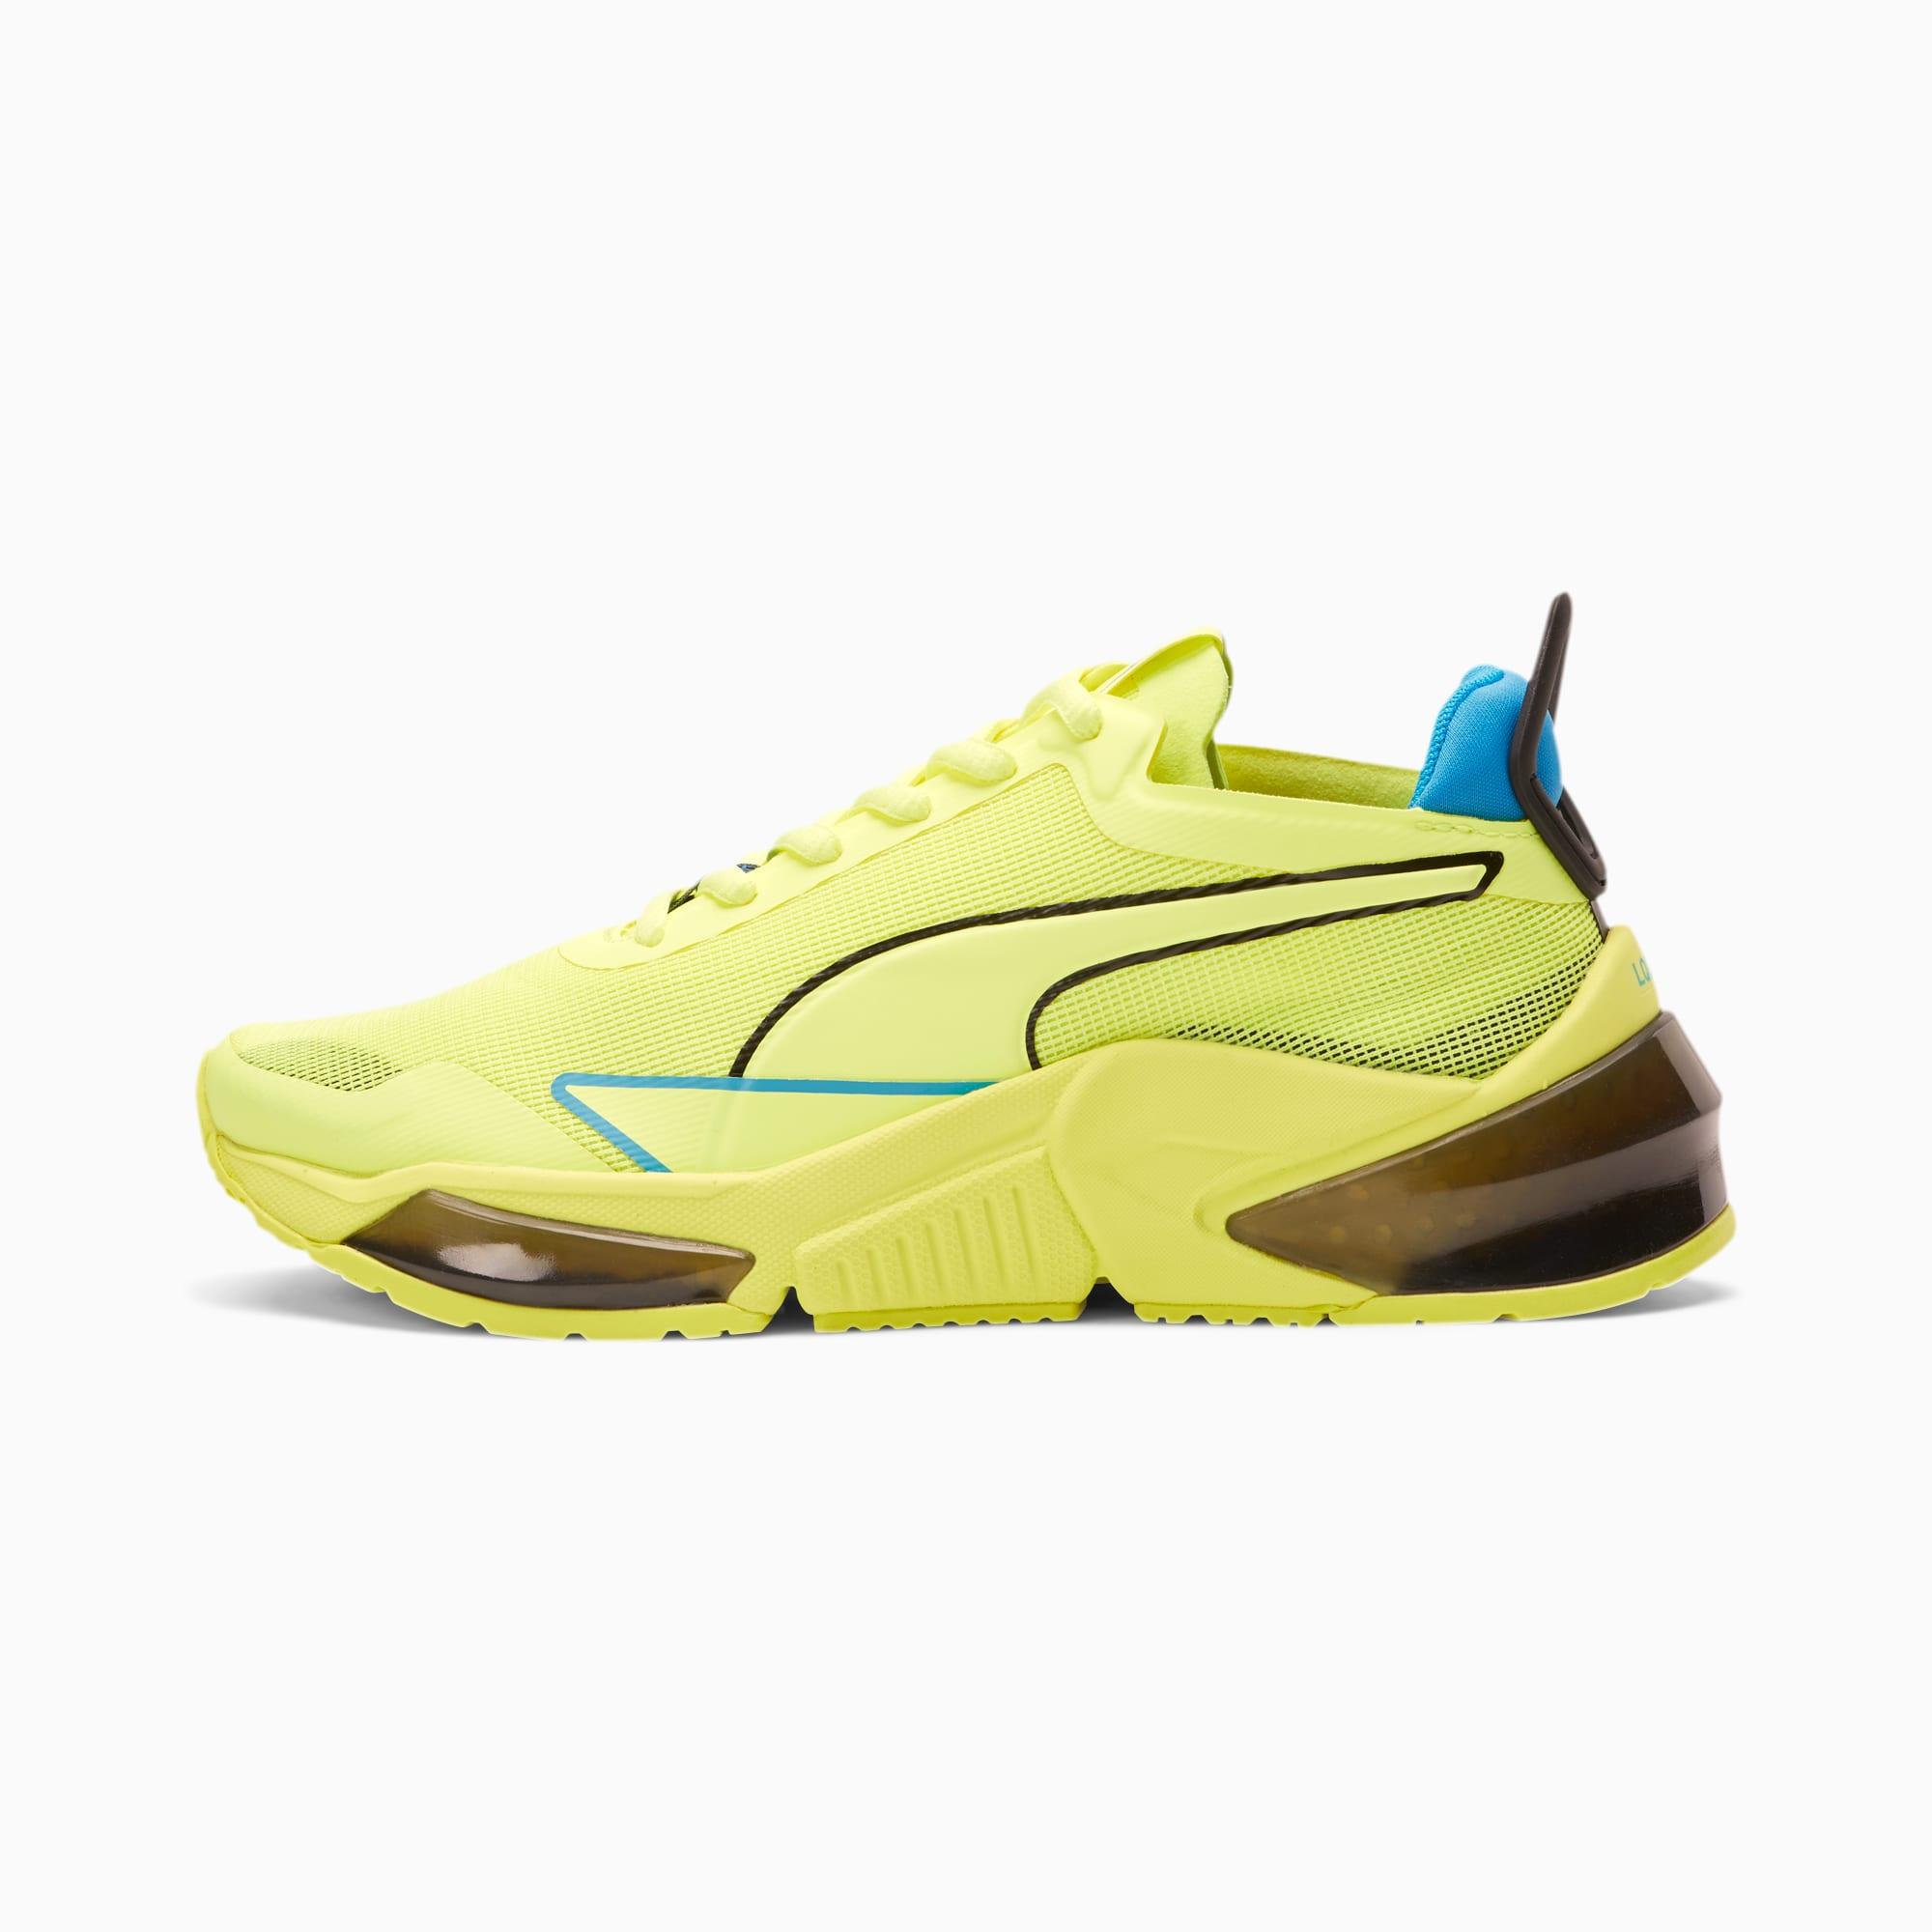 PUMA x FIRST MILE LQDCELL Optic Xtreme Training Shoes JR